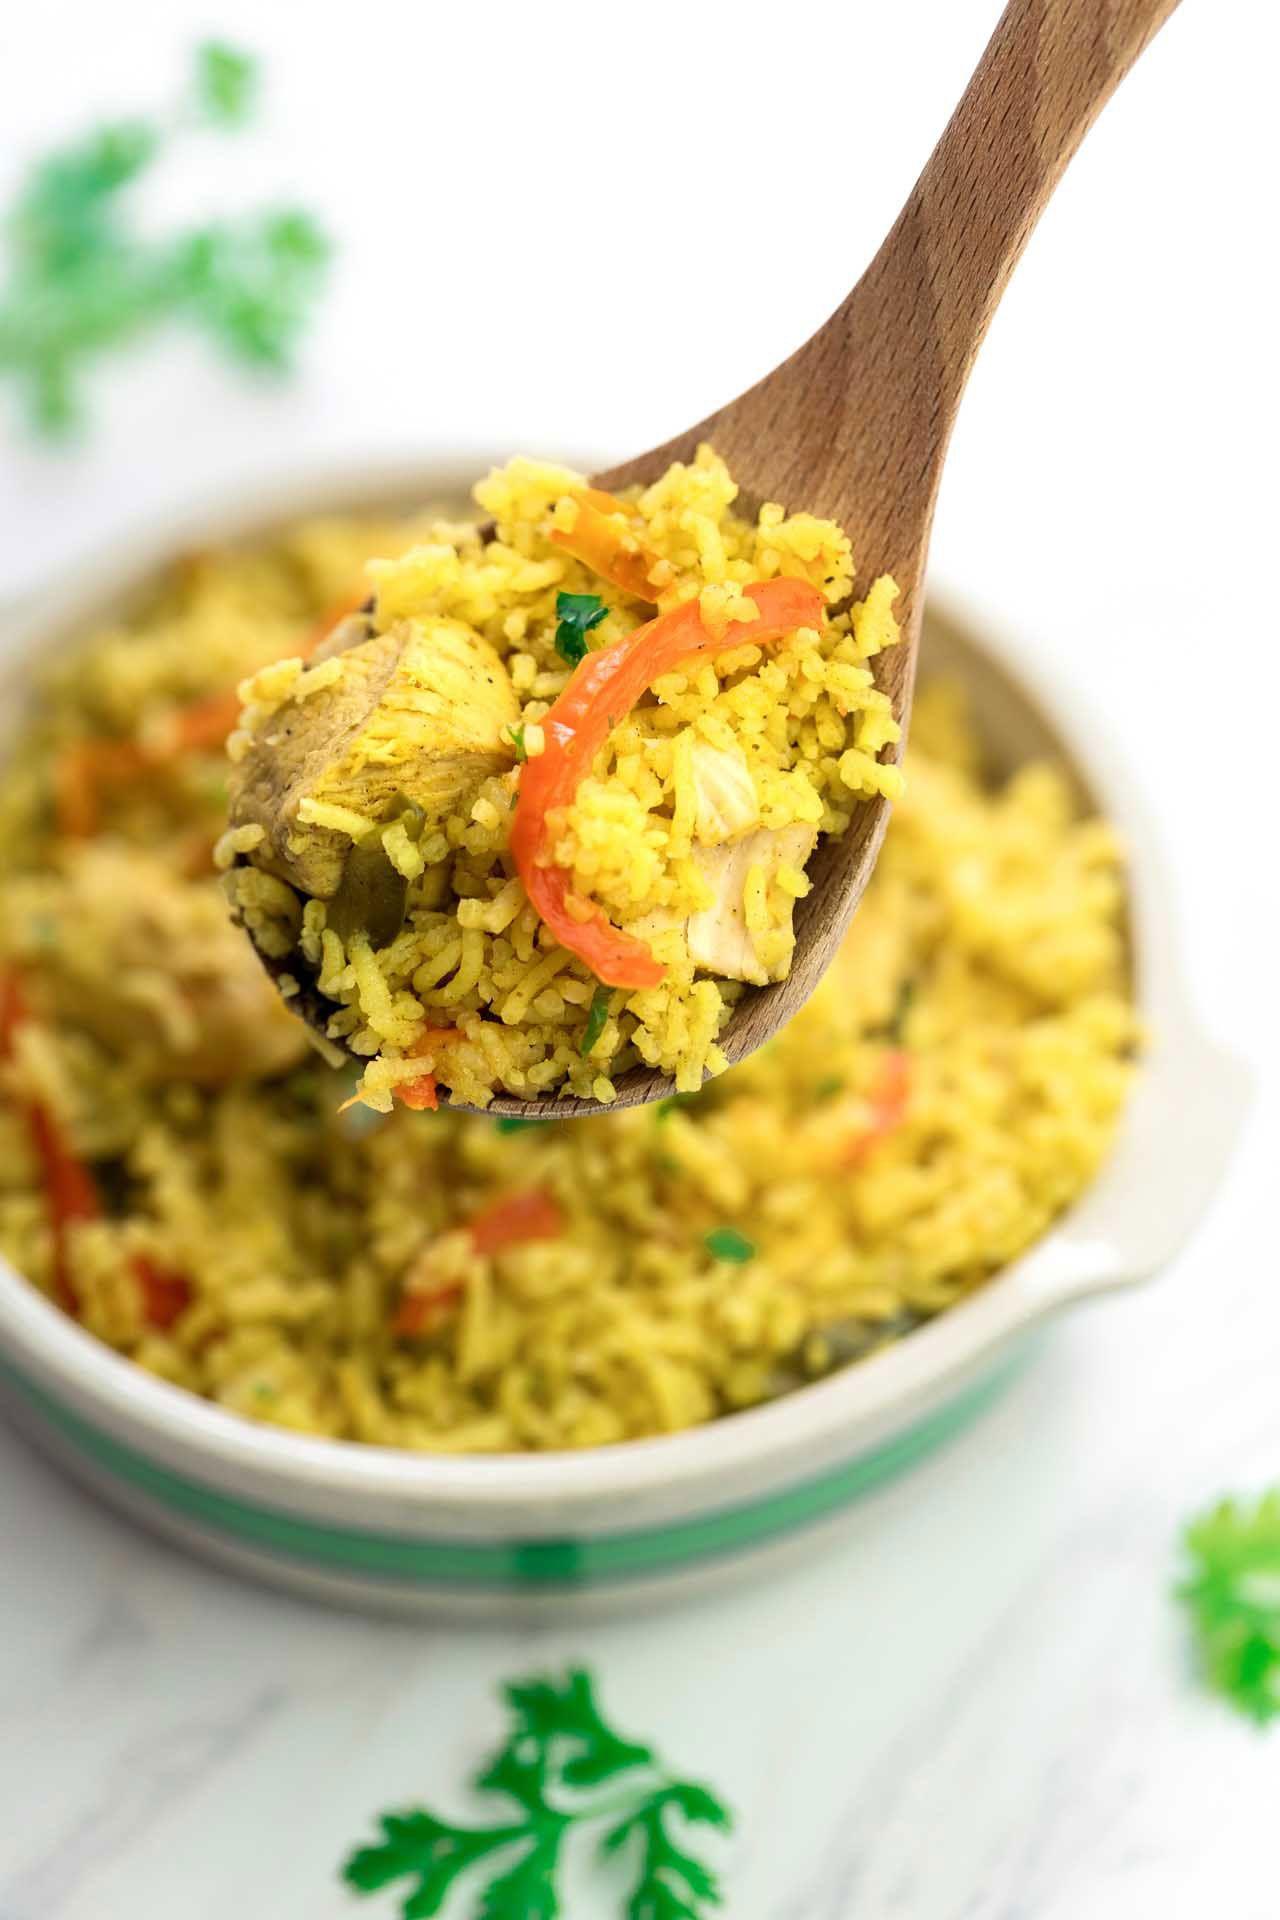 Is Chicken Biryani healthy